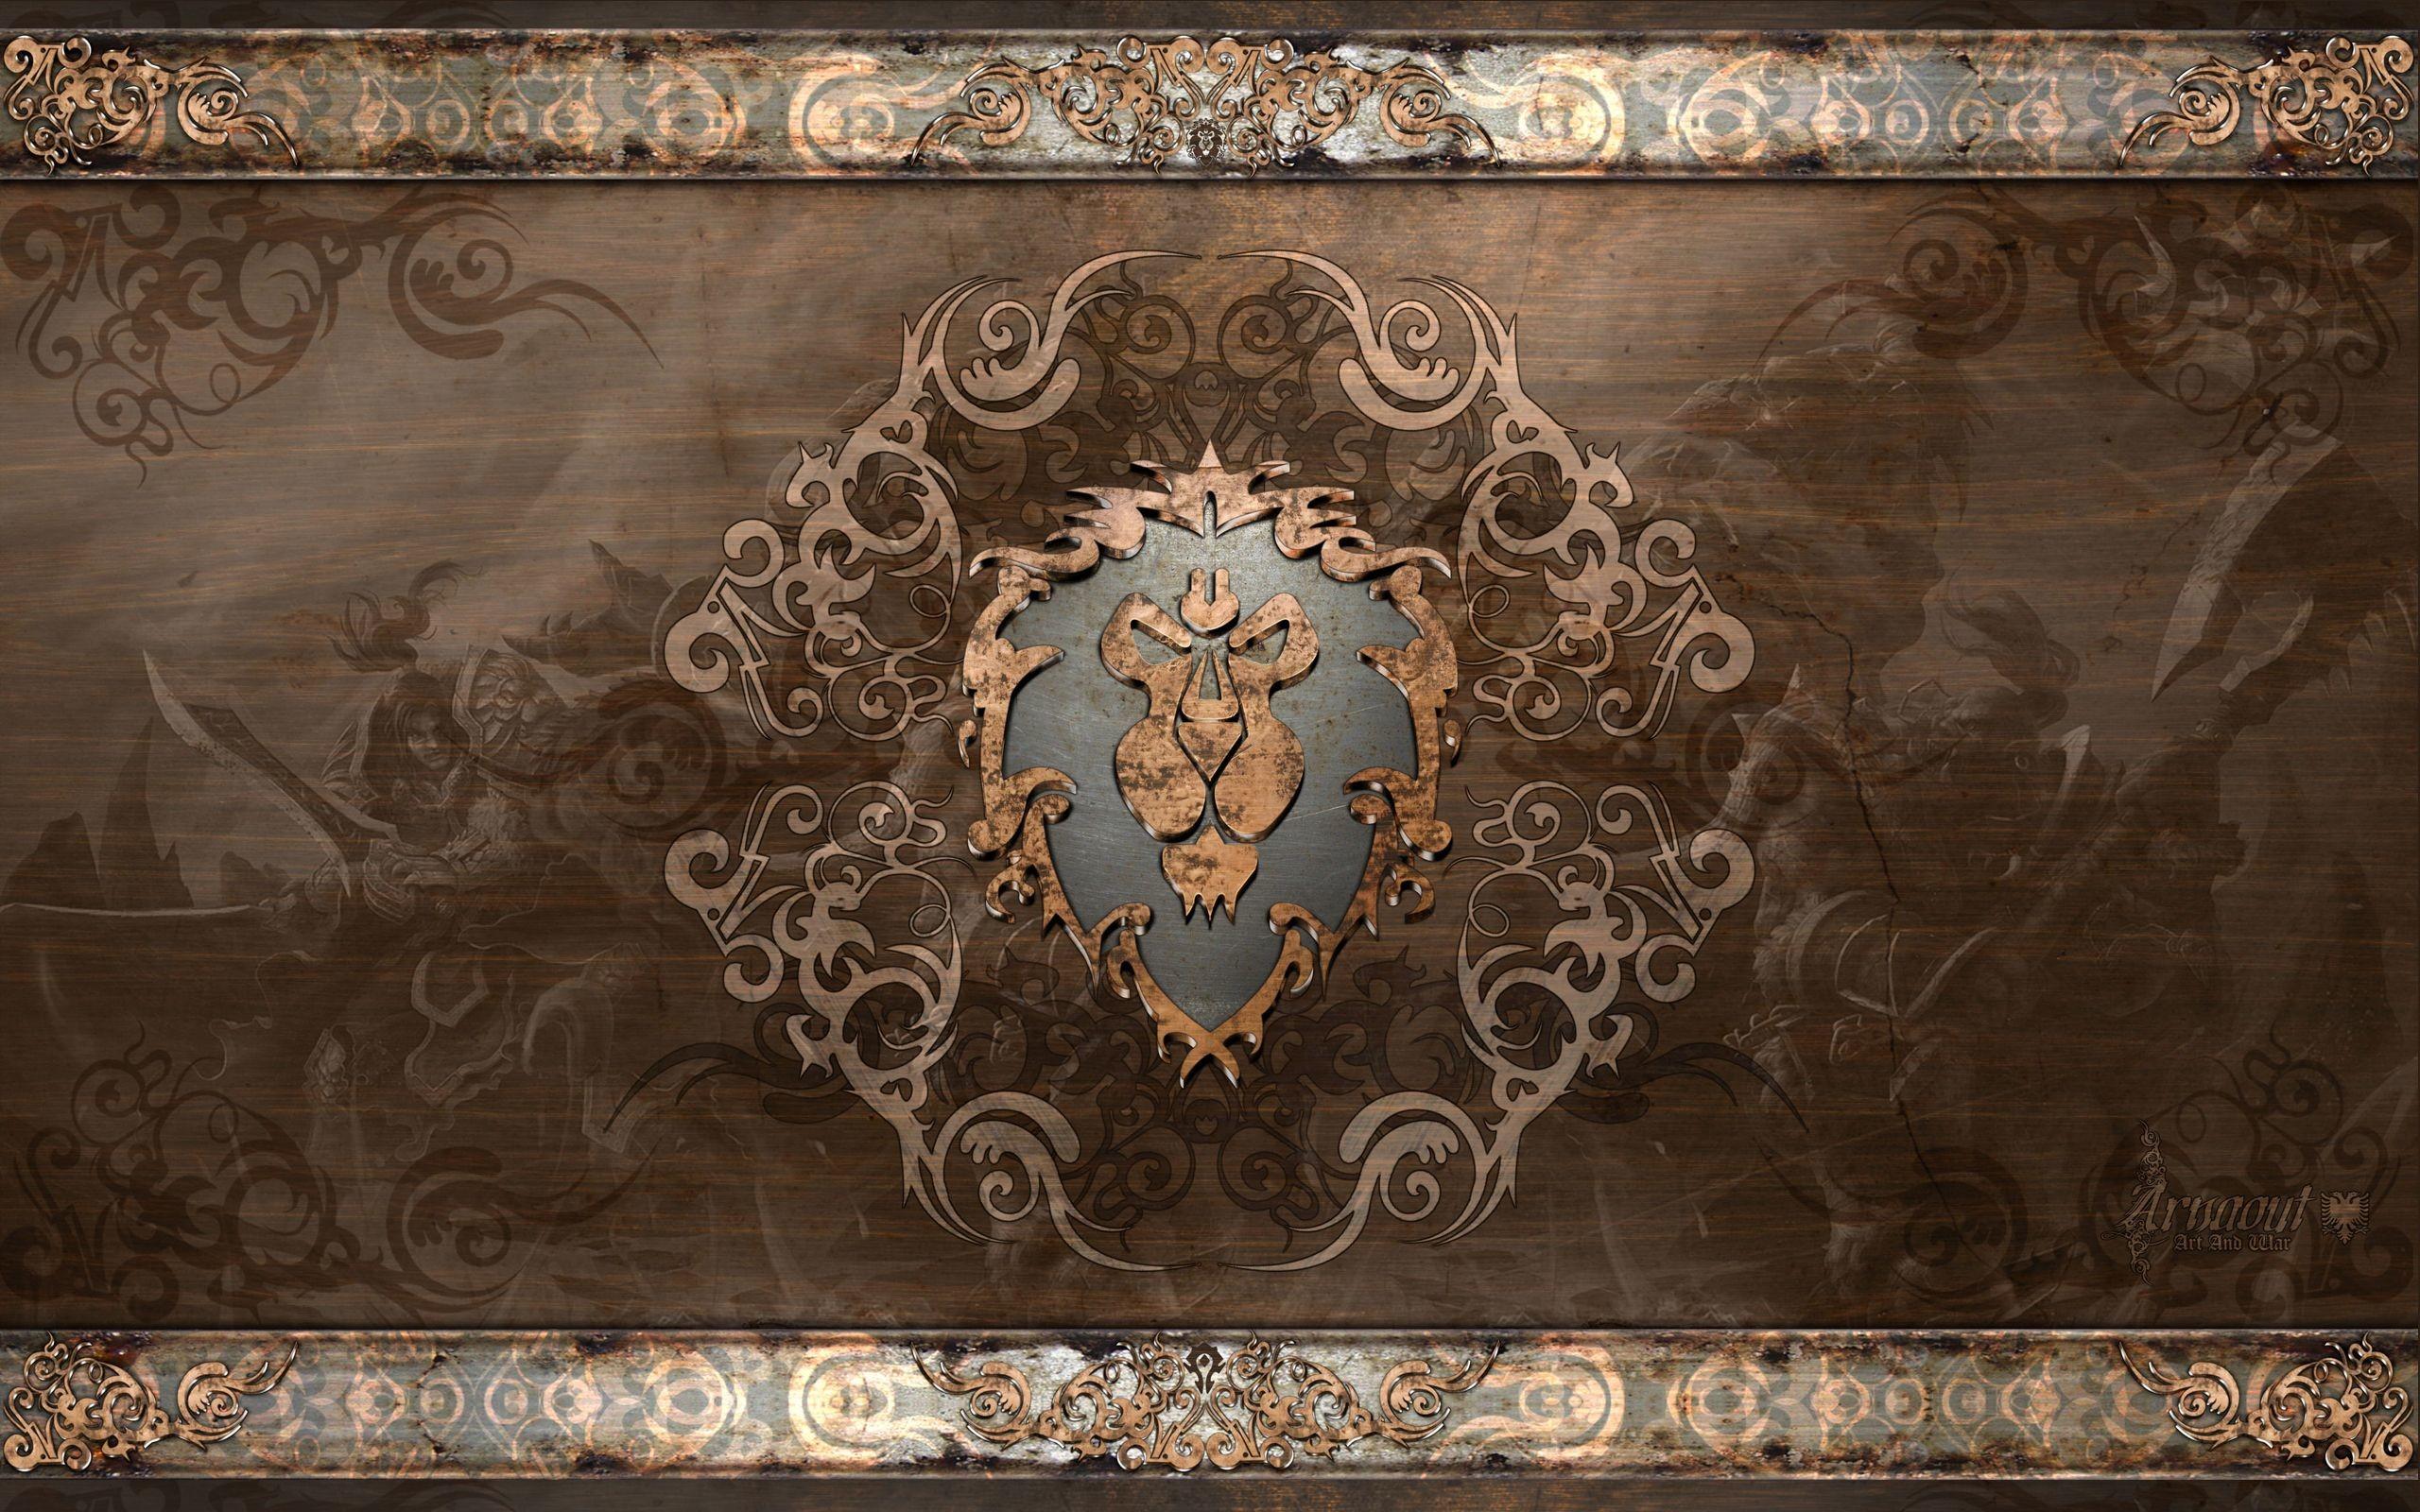 … World Of Warcraft Wallpaper Alliance (11) …